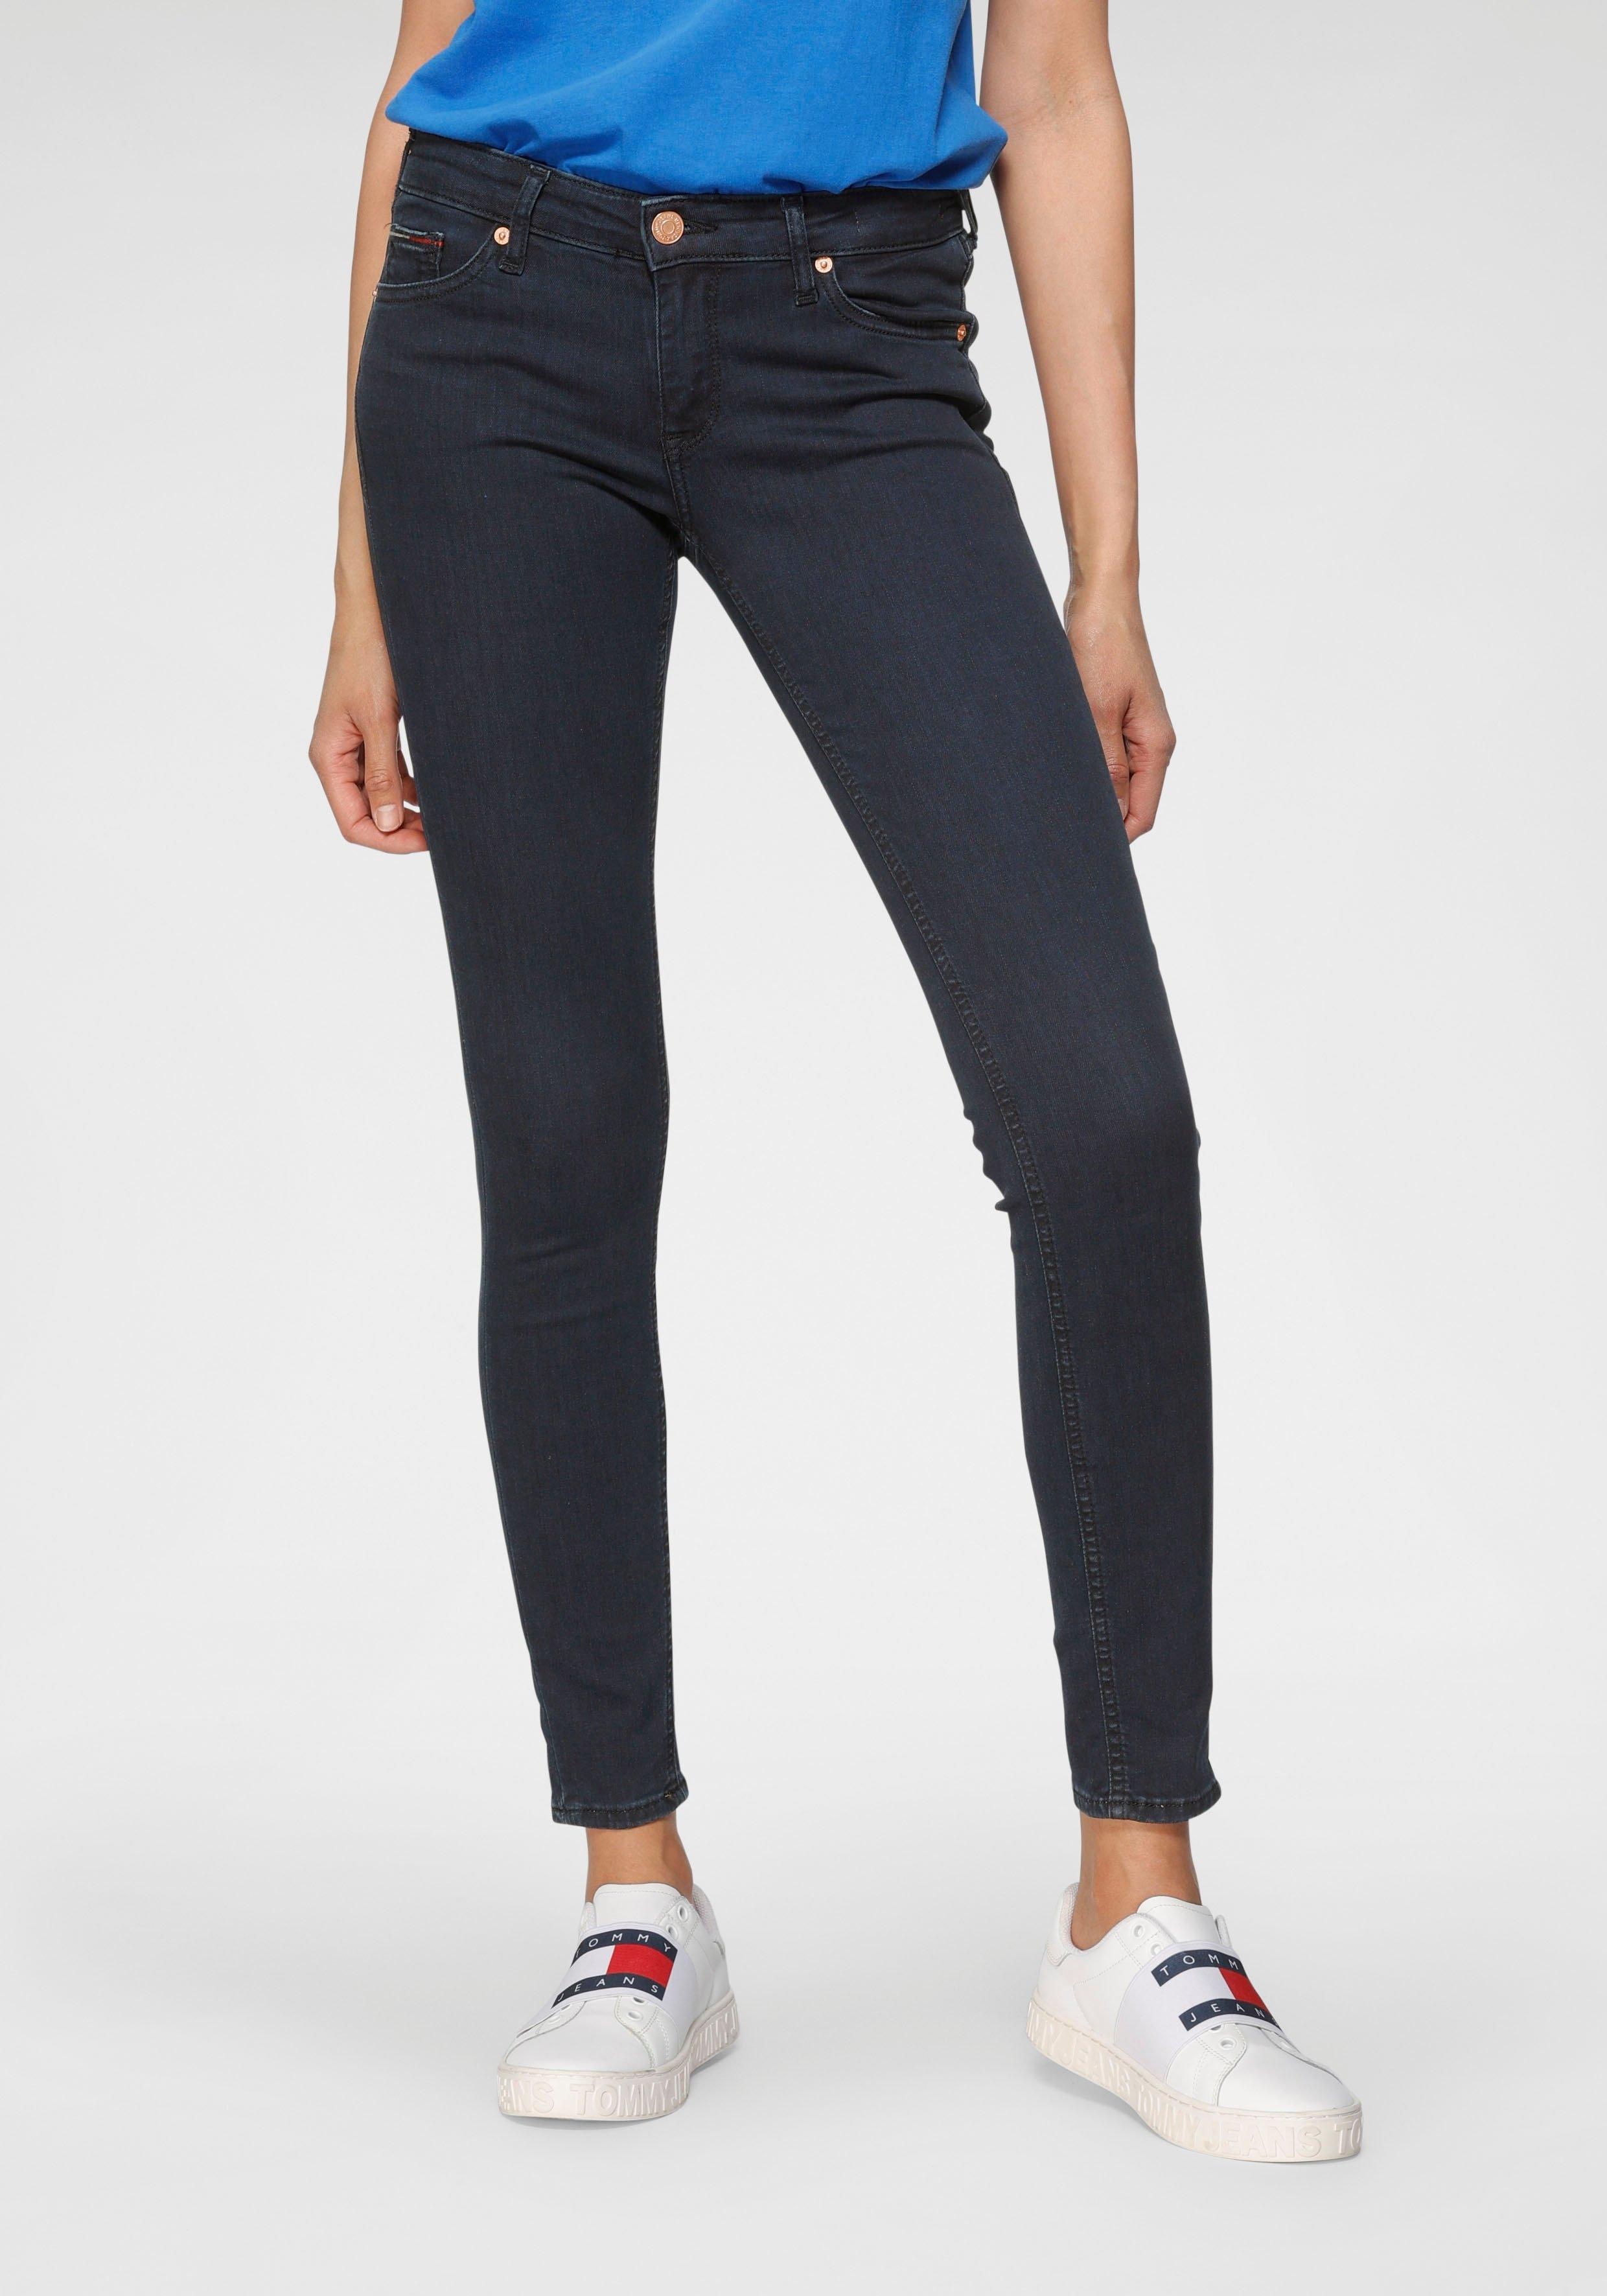 TOMMY JEANS skinny fit jeans SOPHIE LR SKNY met tommy jeans-logobadge & borduursels in de webshop van OTTO kopen